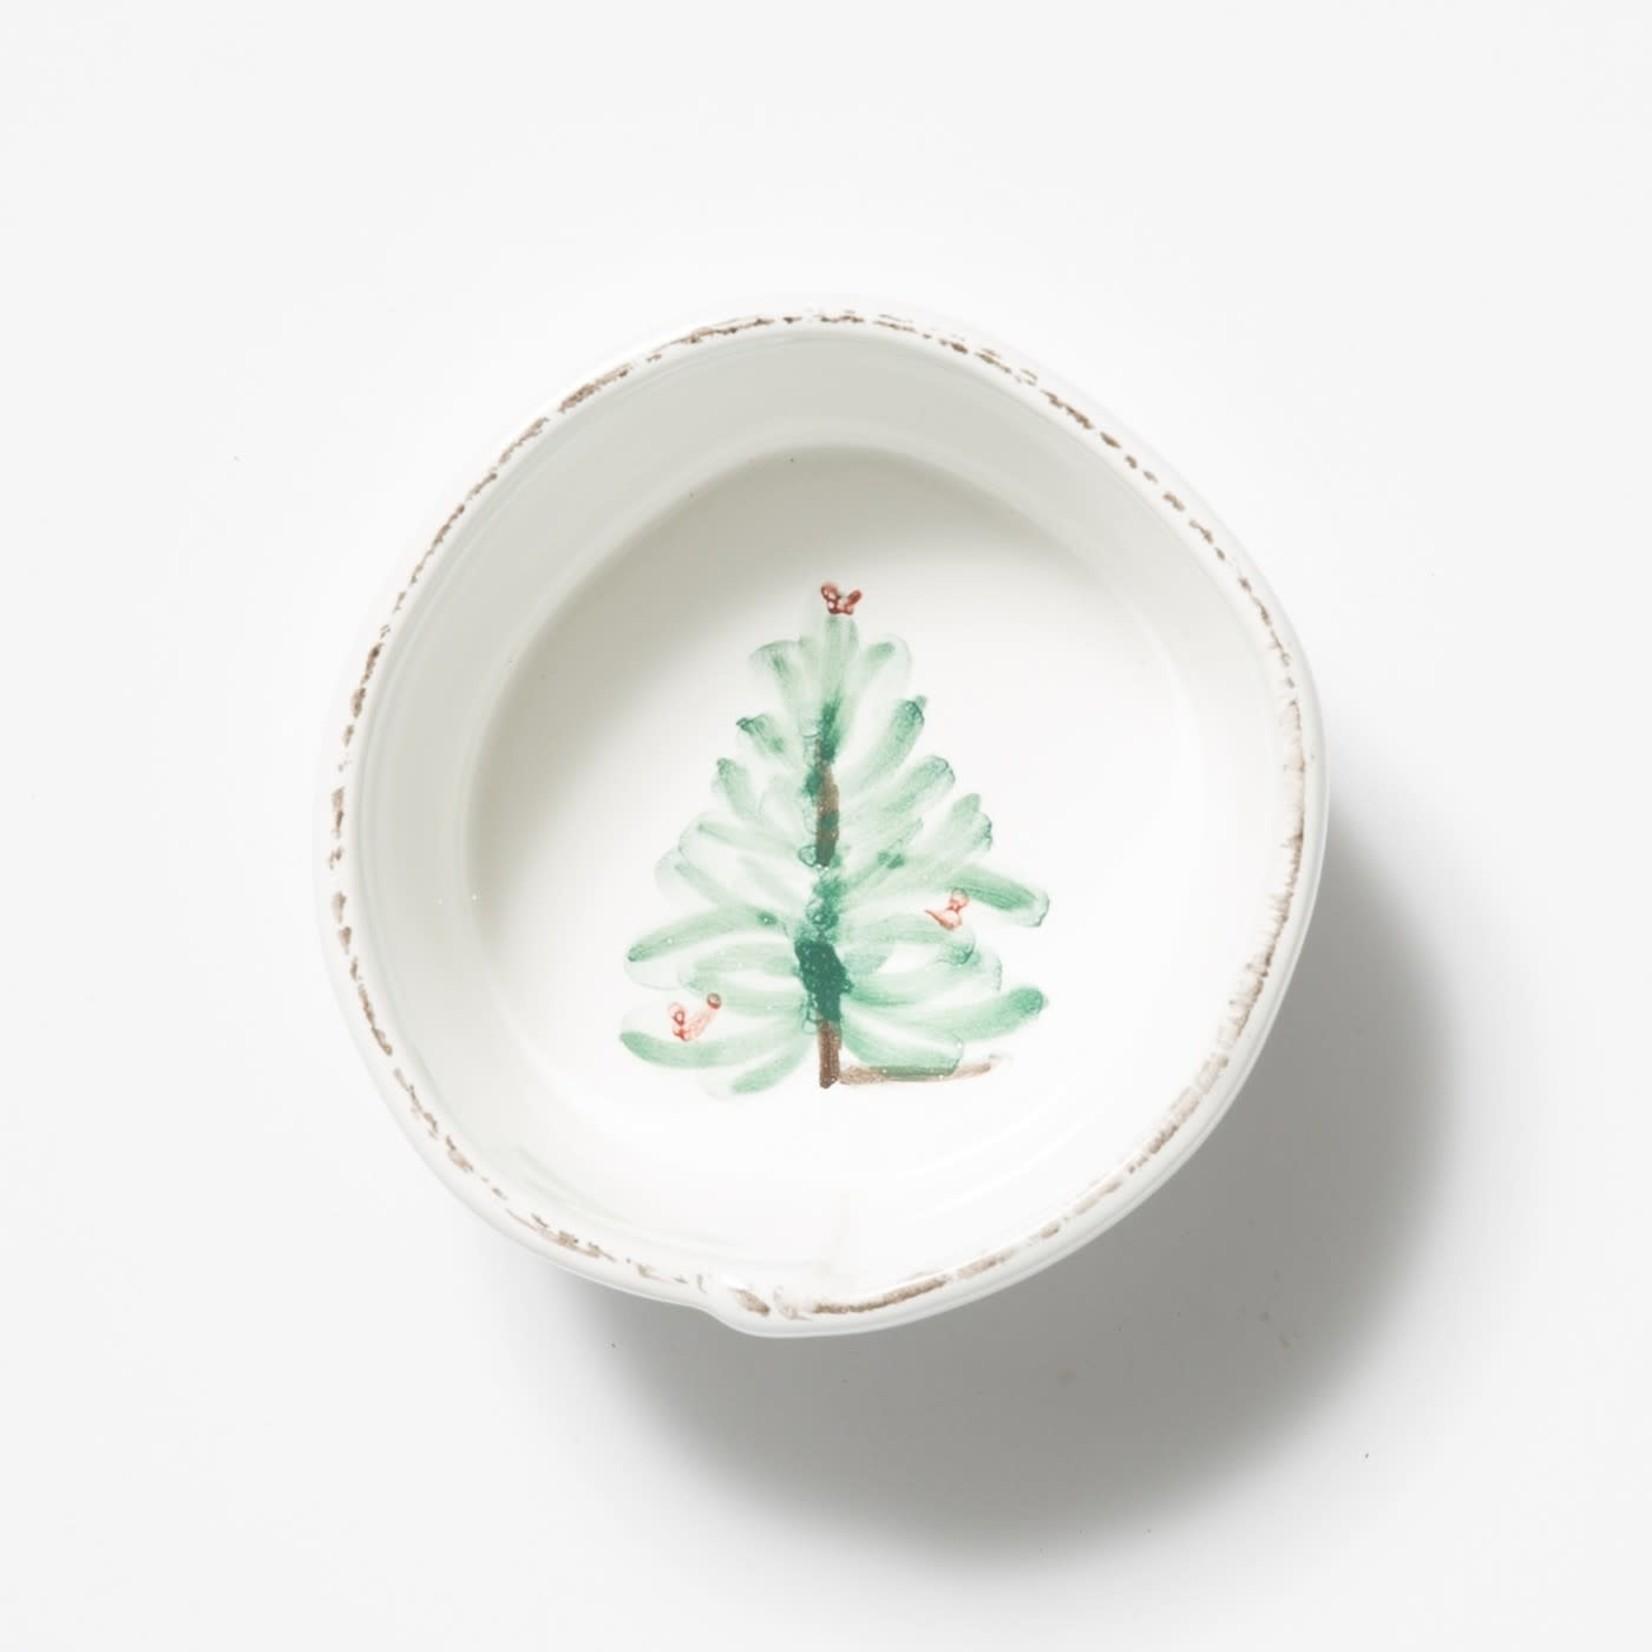 Lastra Holiday Condiment Bowl